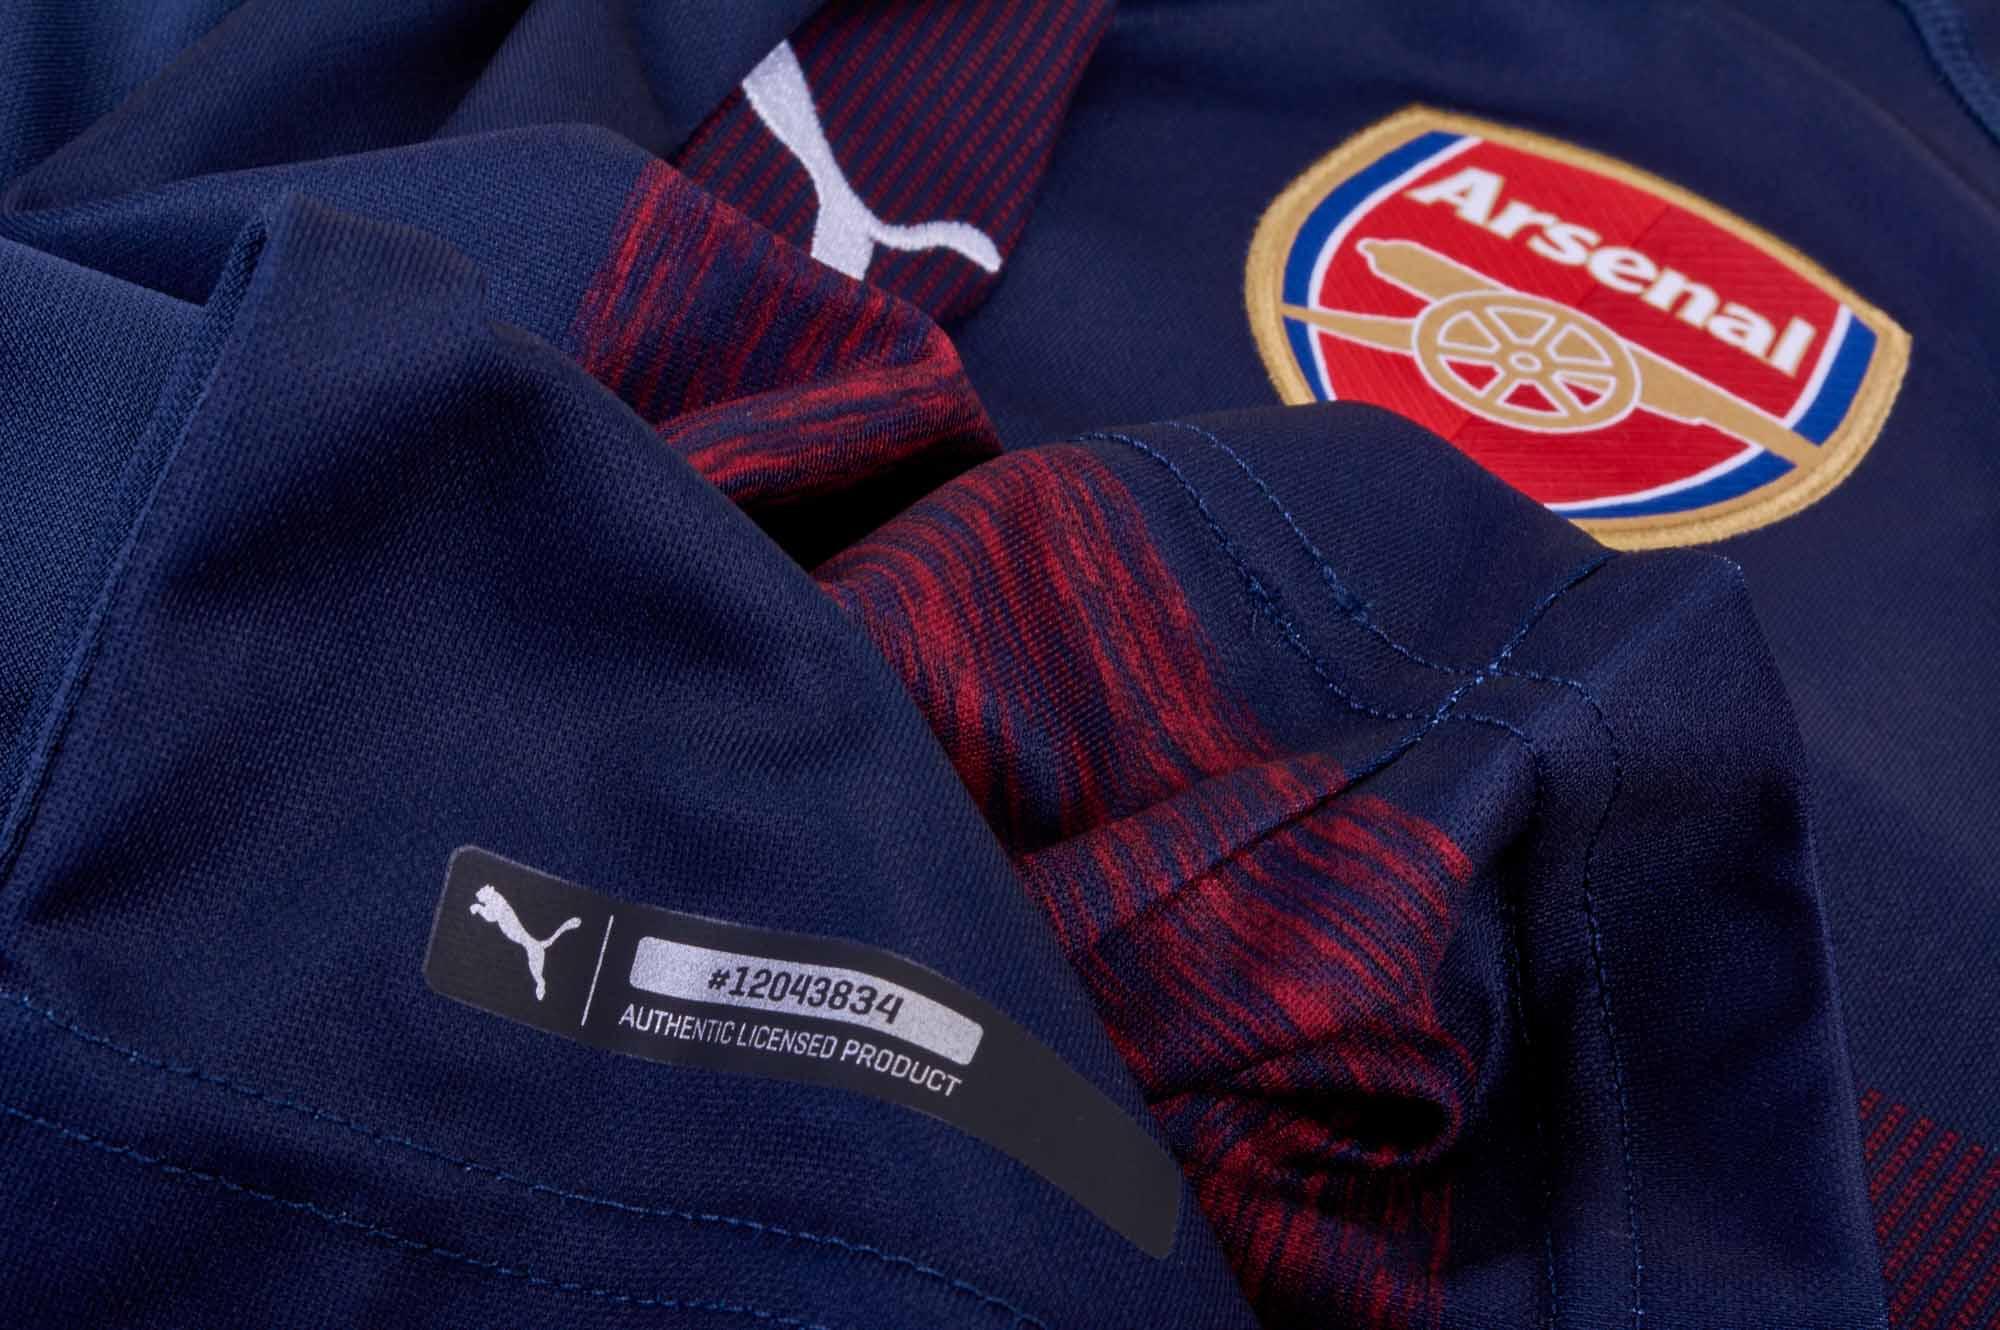 2018/19 PUMA Aaron Ramsey Arsenal Away Jersey - SoccerPro